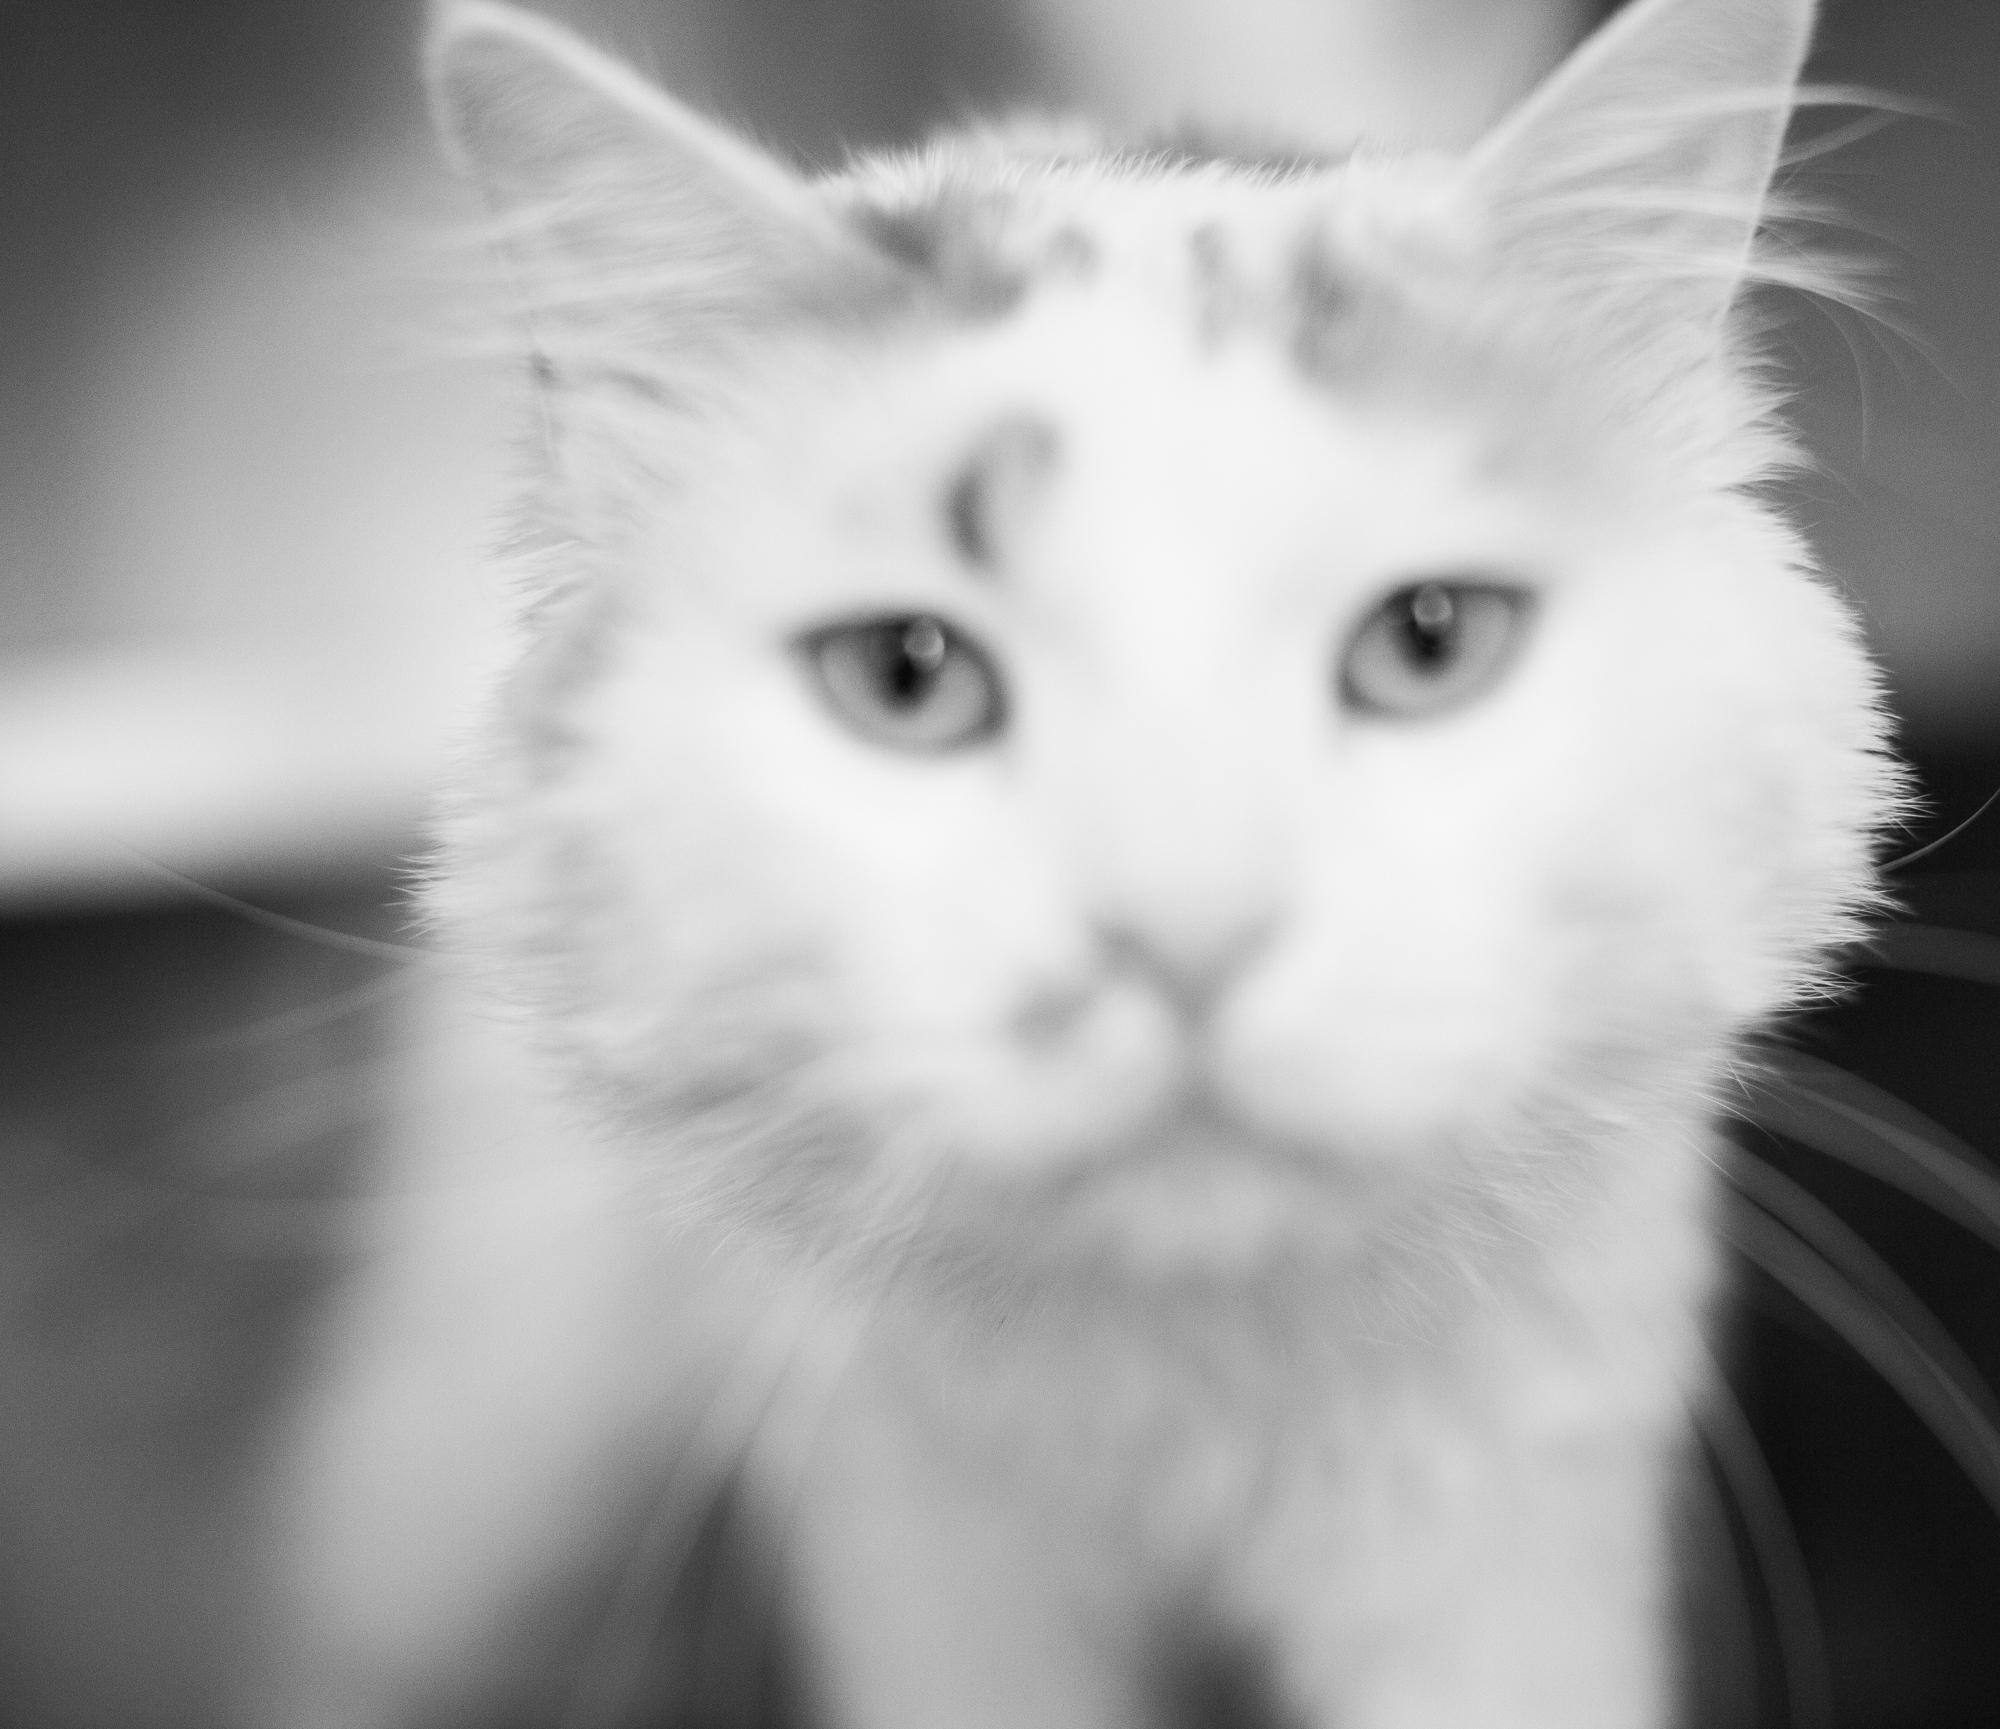 040_animal-photography-cats-dogs-volunteer_MG_8469.jpg